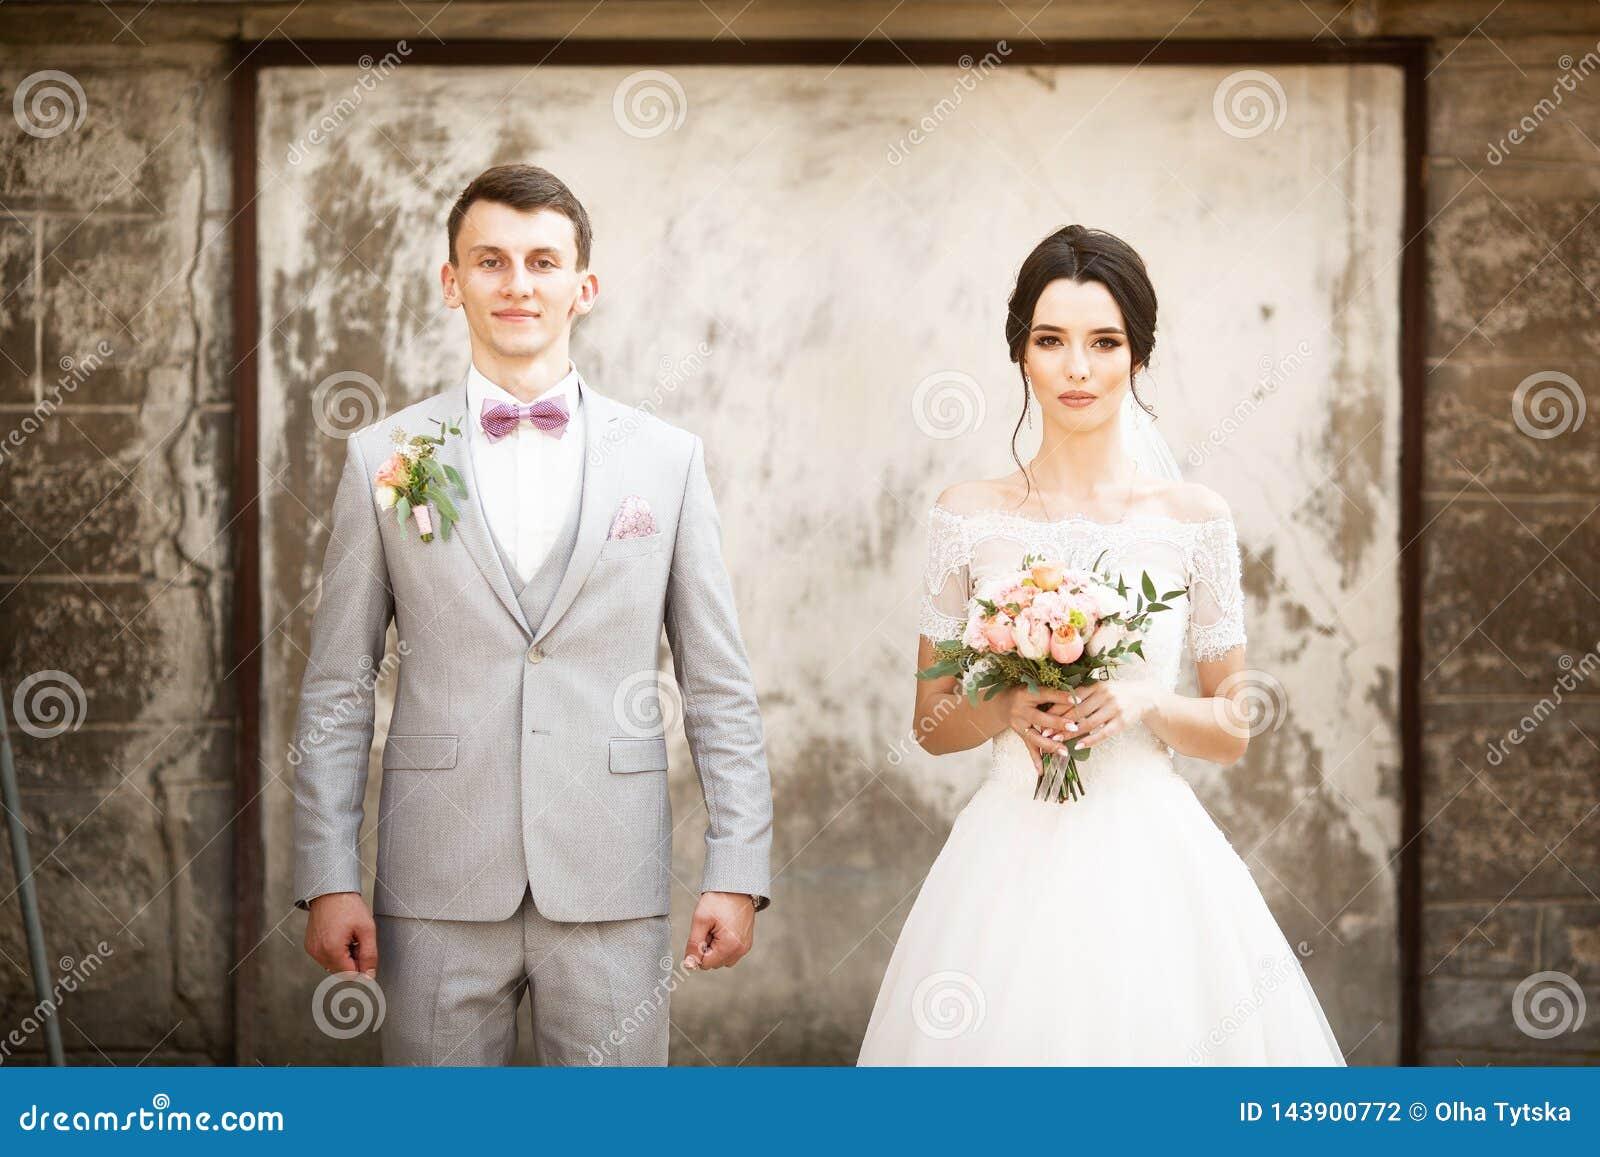 Beautiful wedding couple posing near the old wall